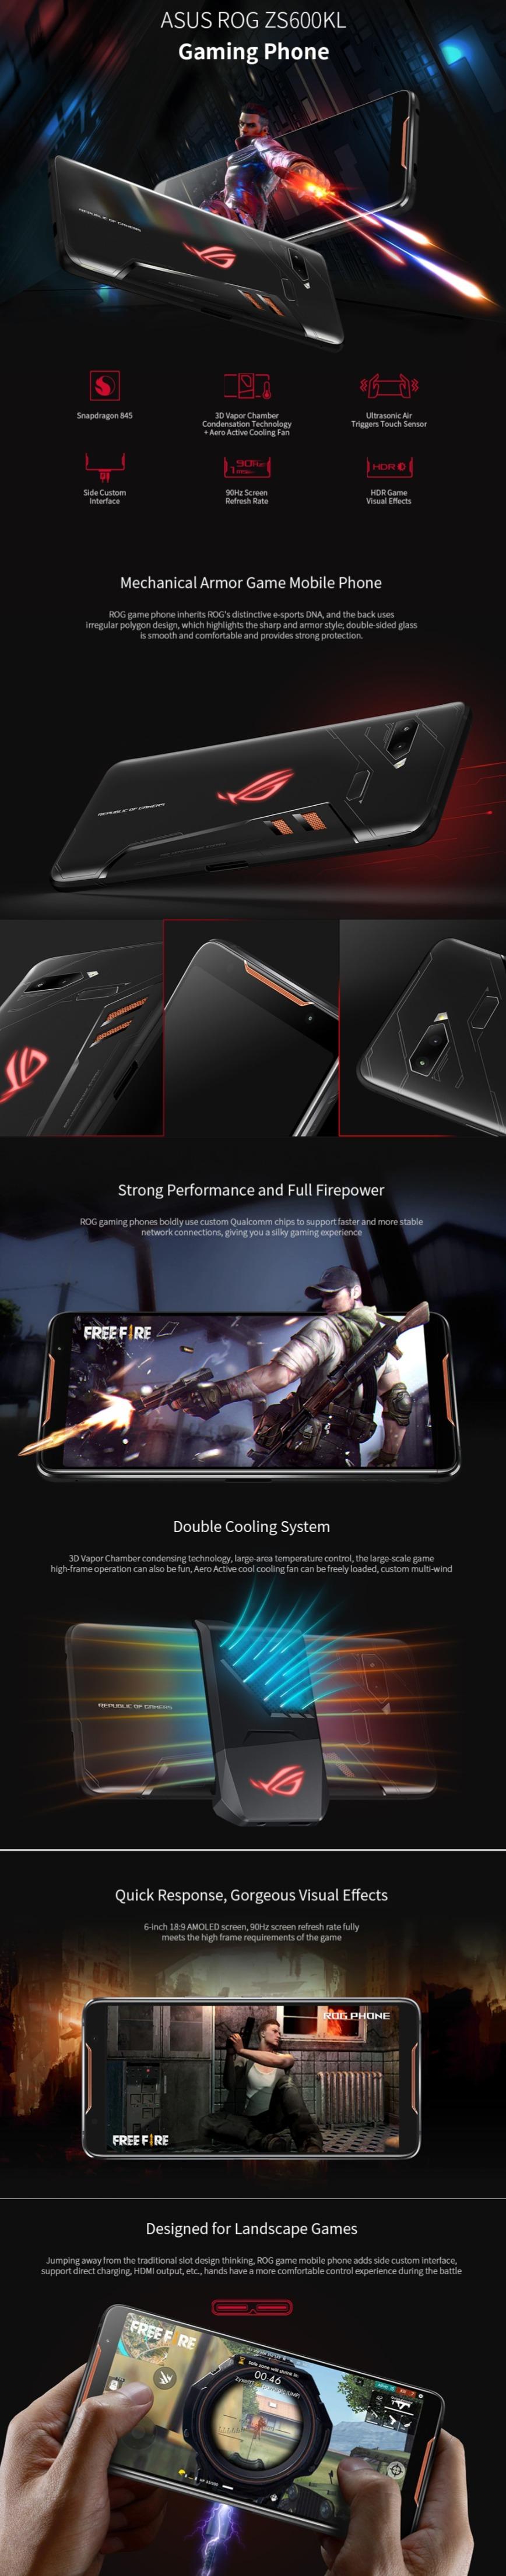 Black Friday ASUS ROG ZS600KL Gaming Phone 4G Smartphone